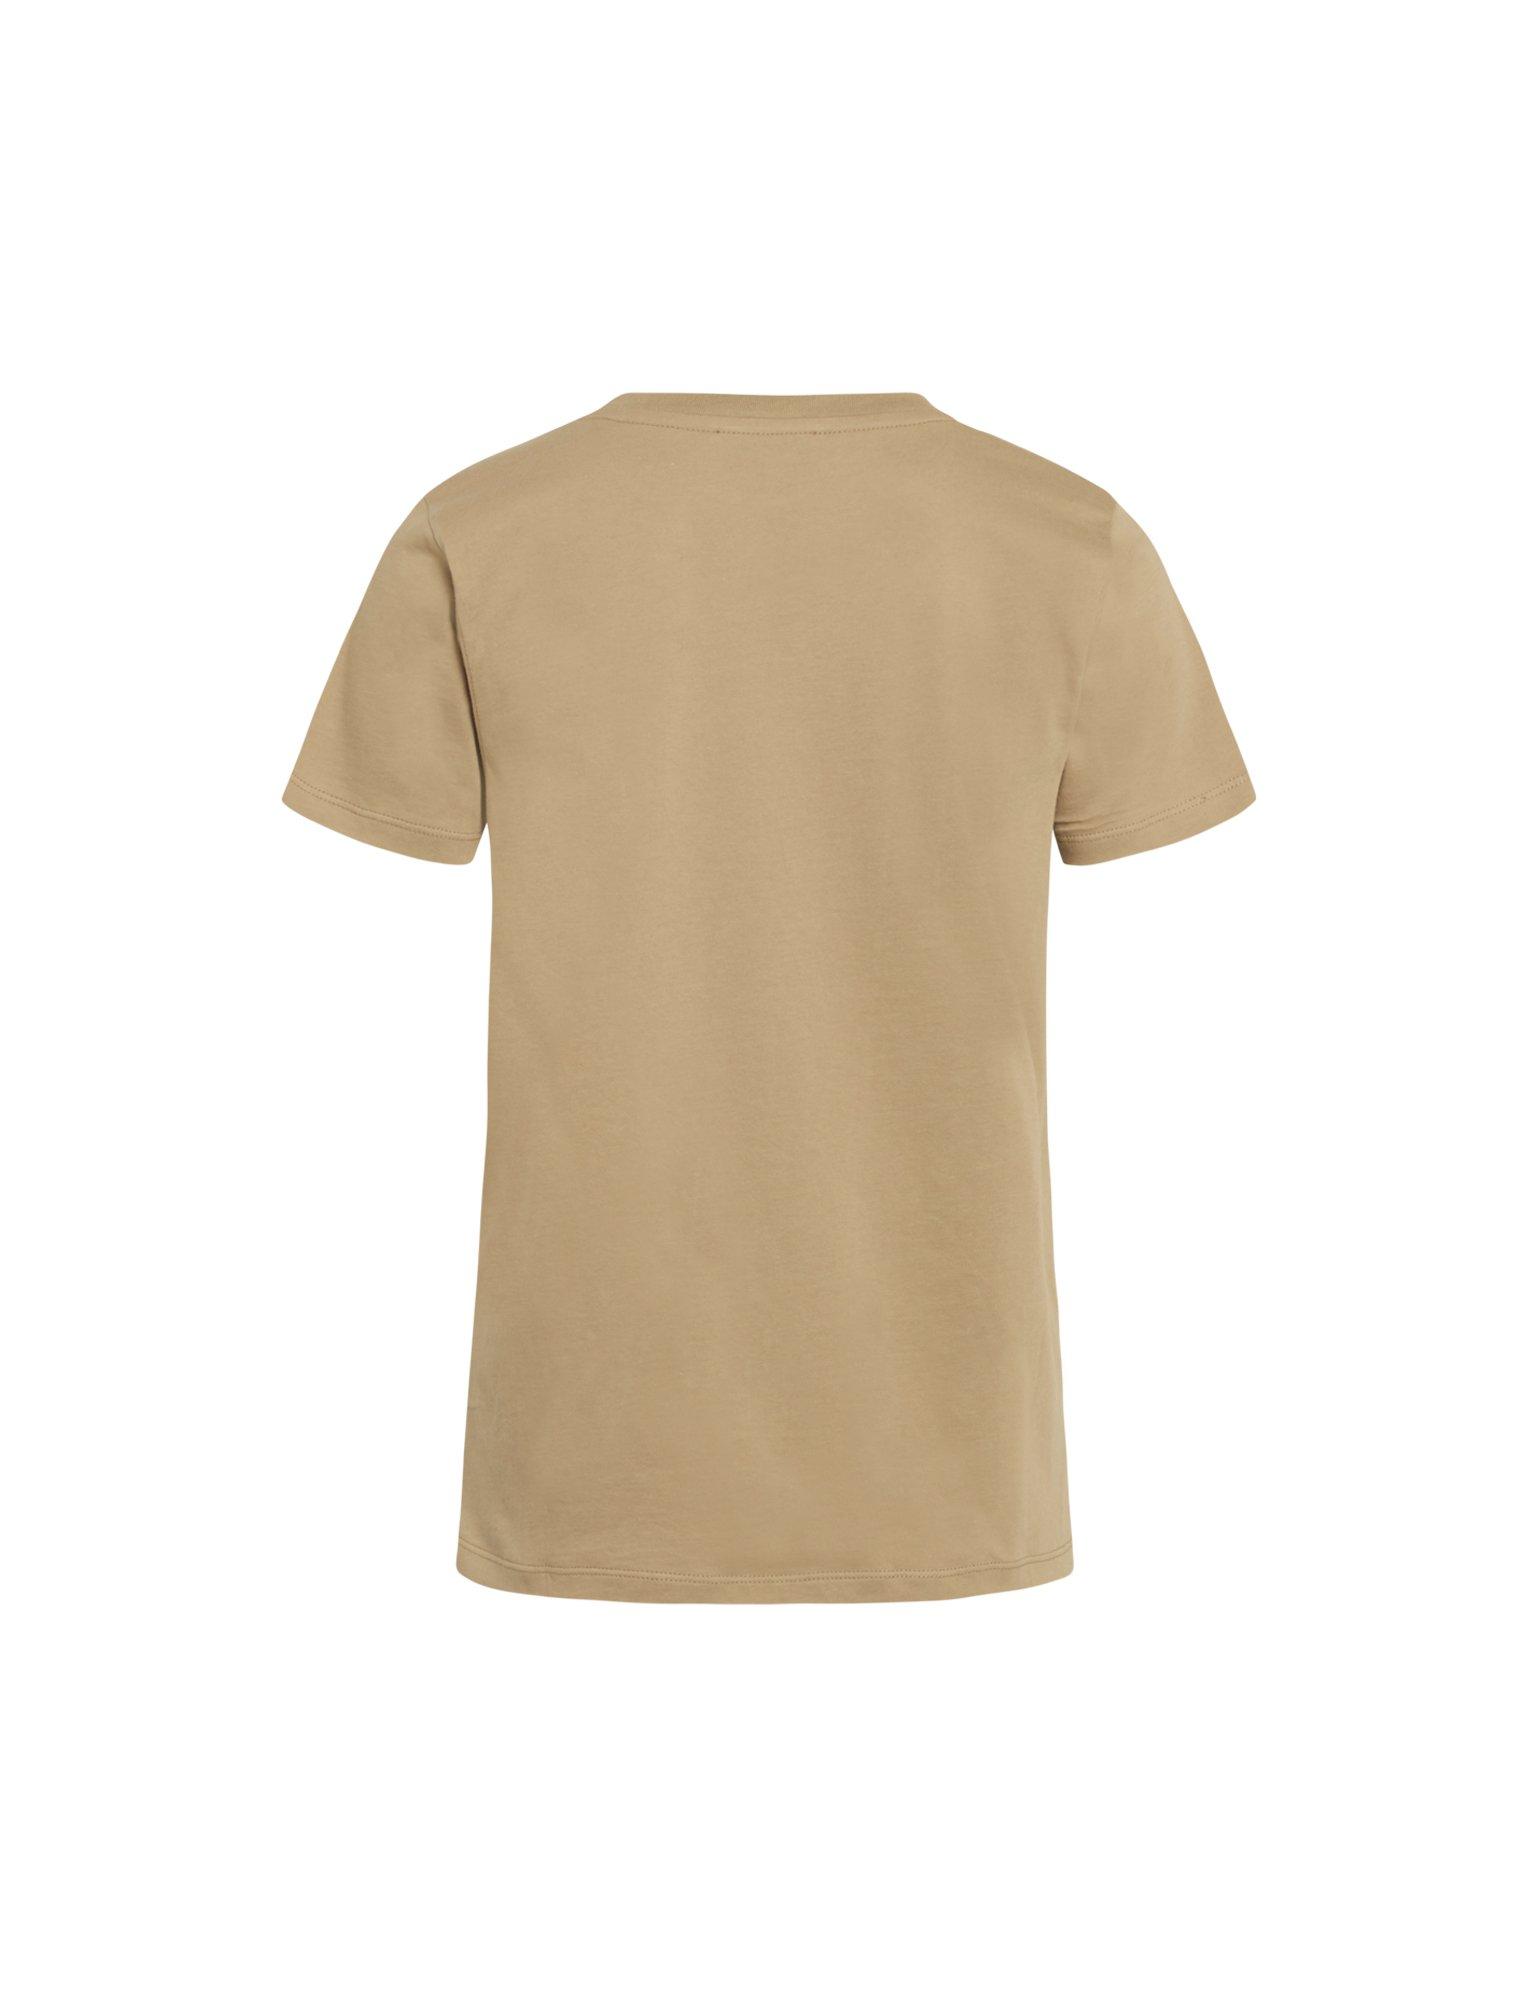 Mads Nørgaard Single Organic Trenda P t-shirt, warm beige, x-large